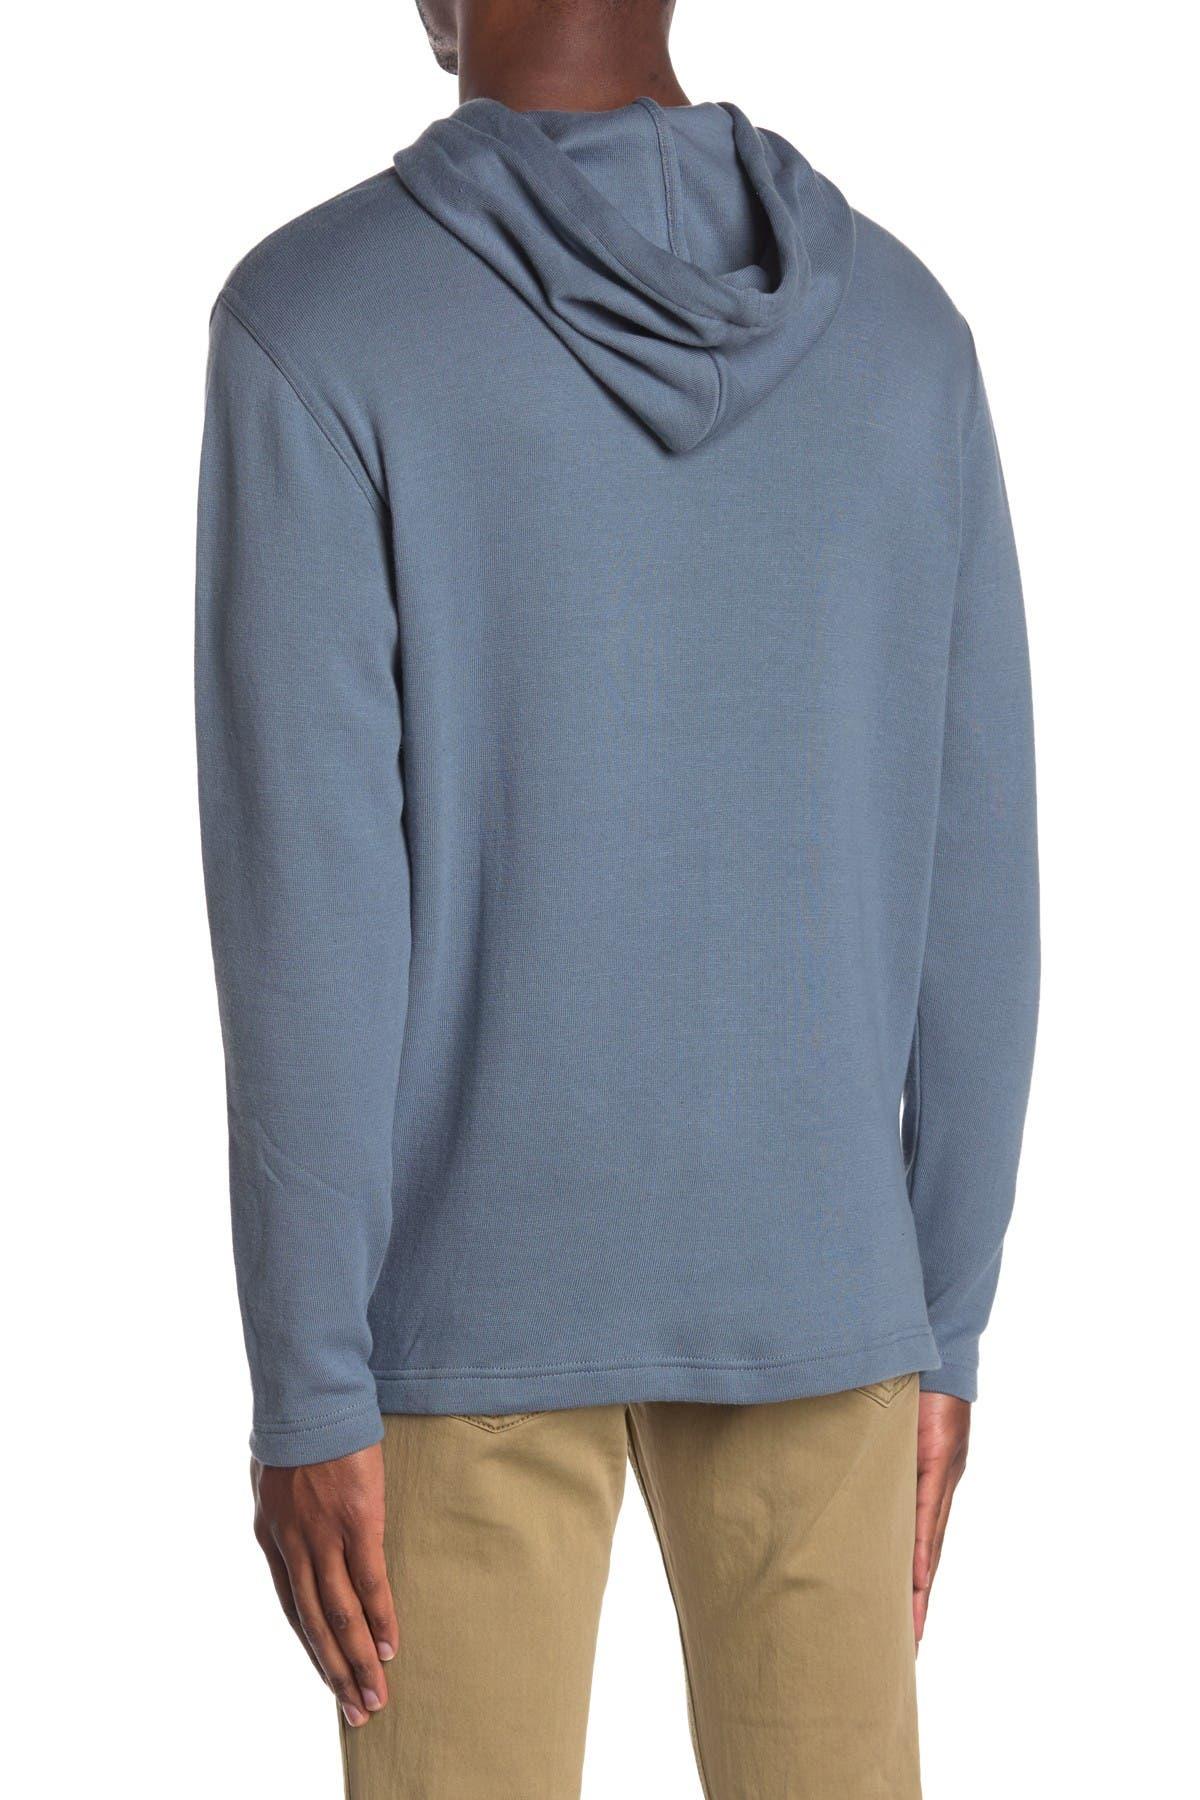 Image of Oxford Milton Long Sleeve Hooded Knit Hoodie